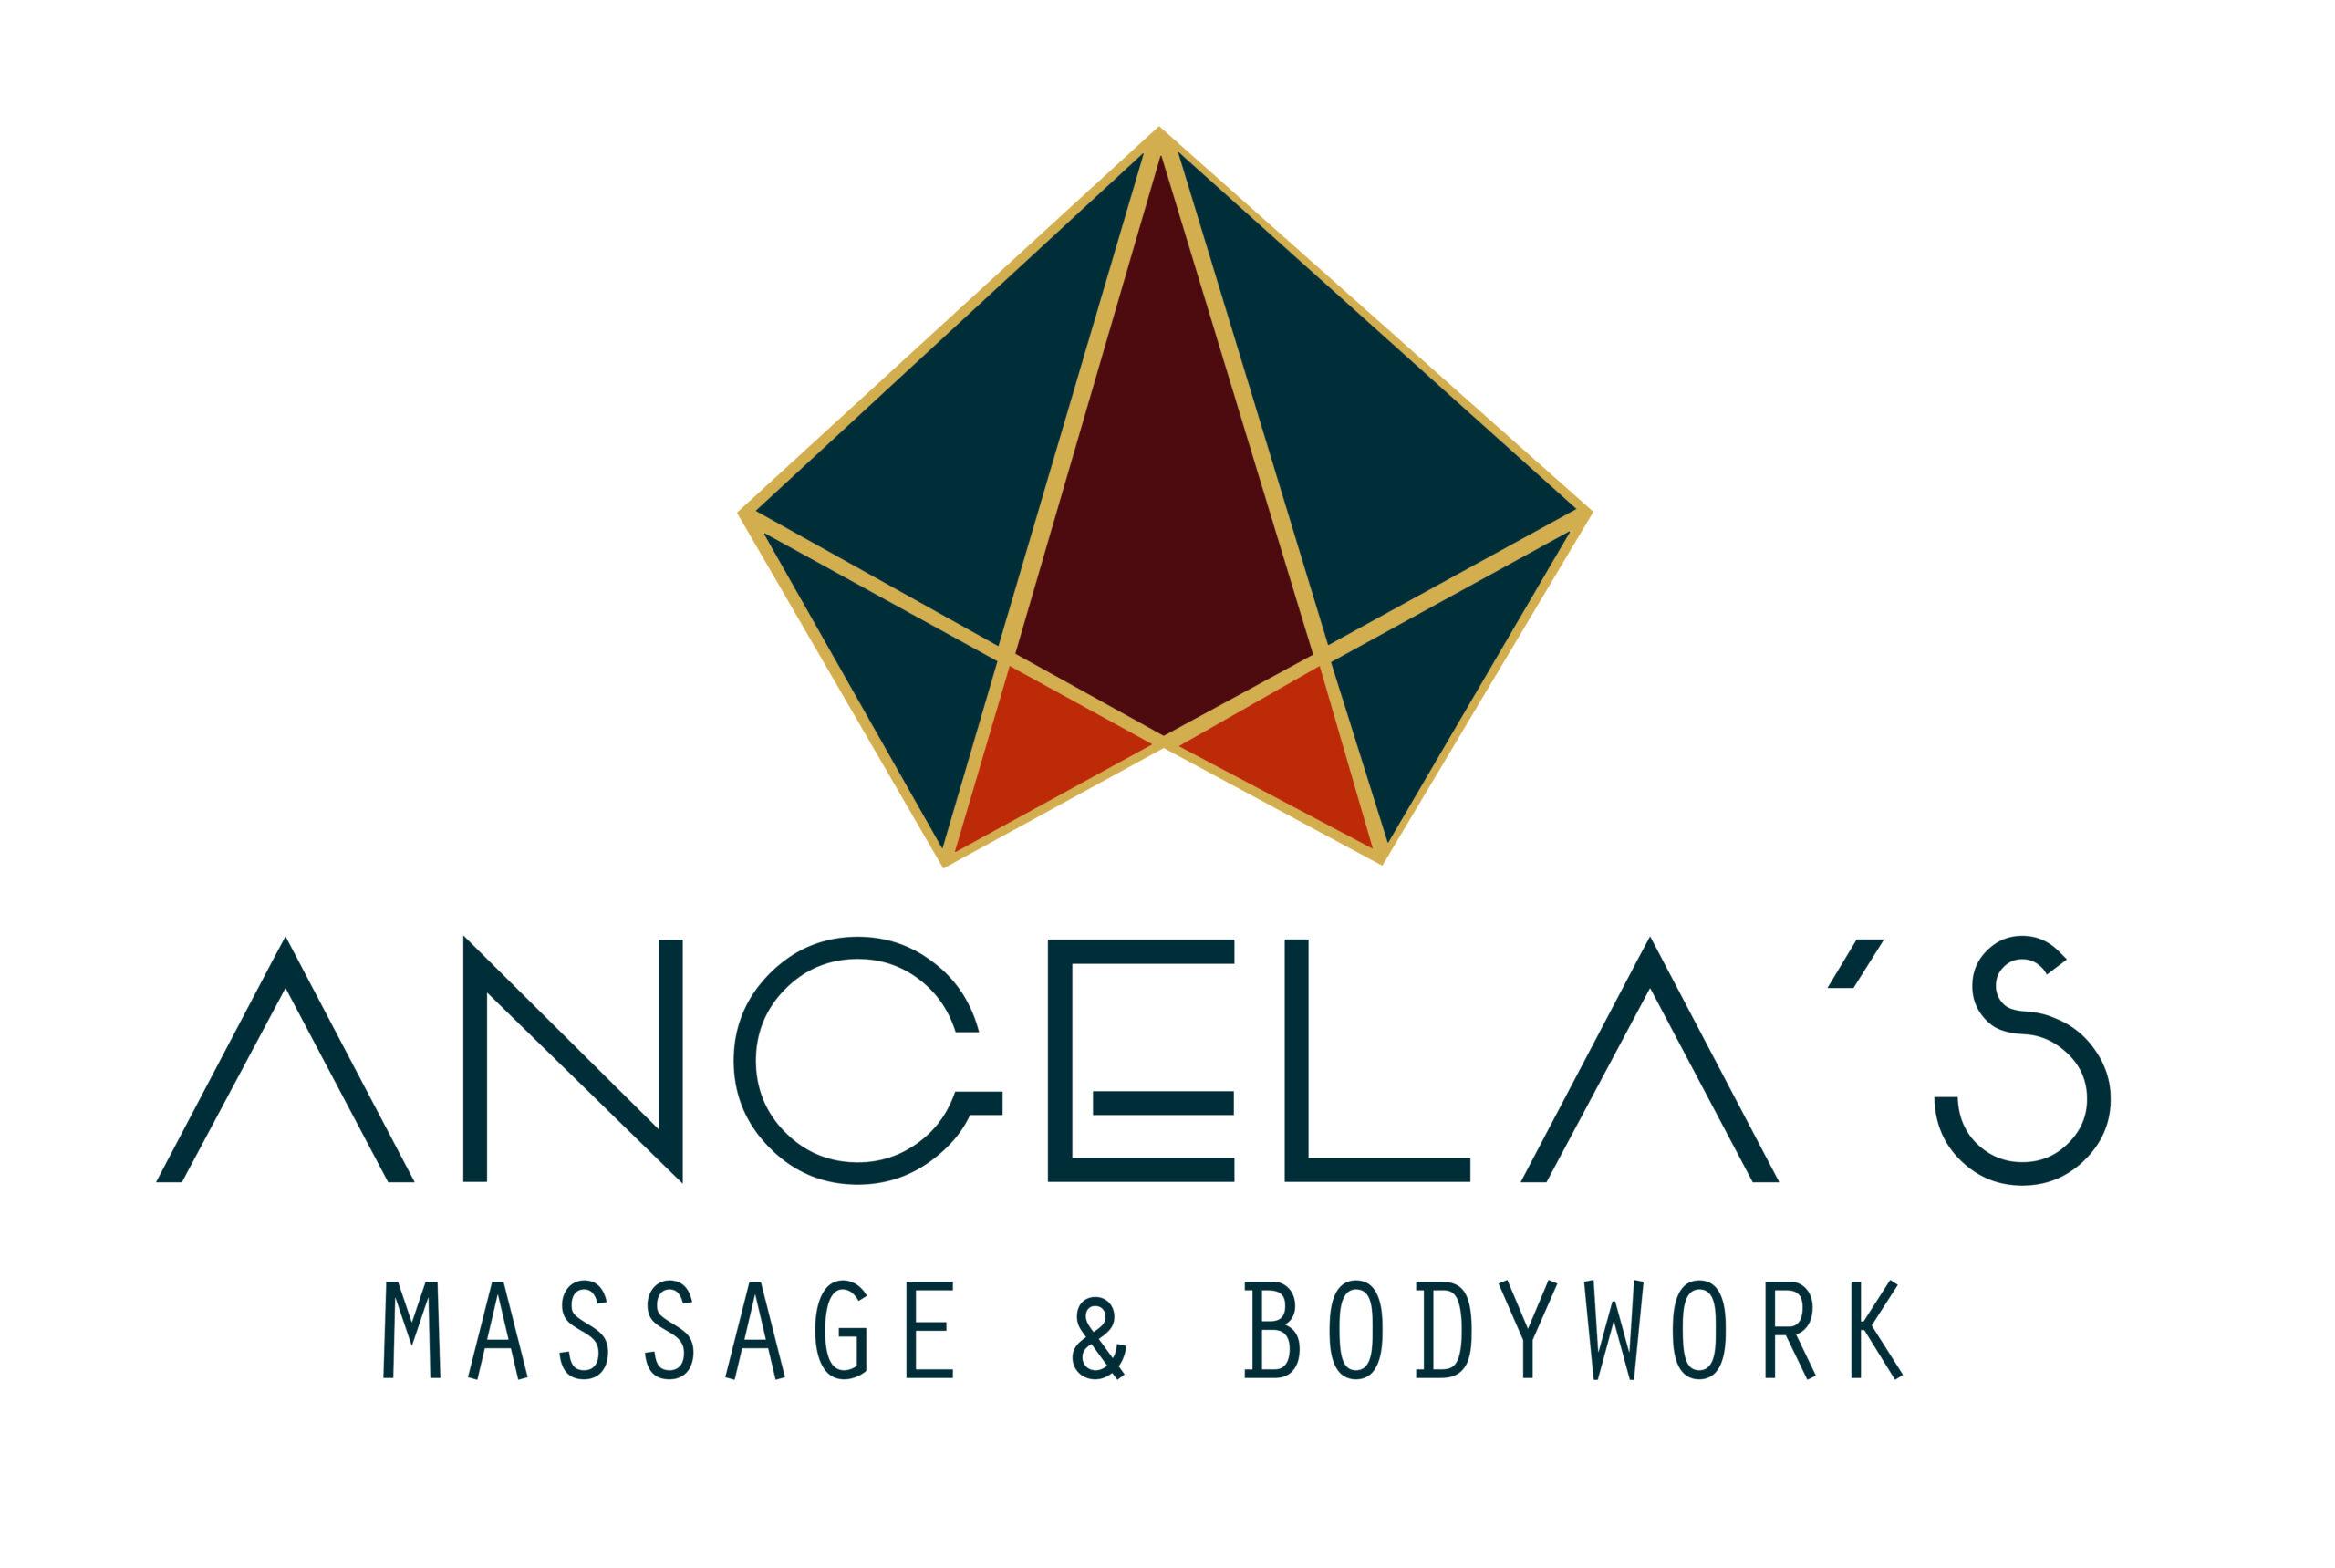 Angela's Massage and Bodywork